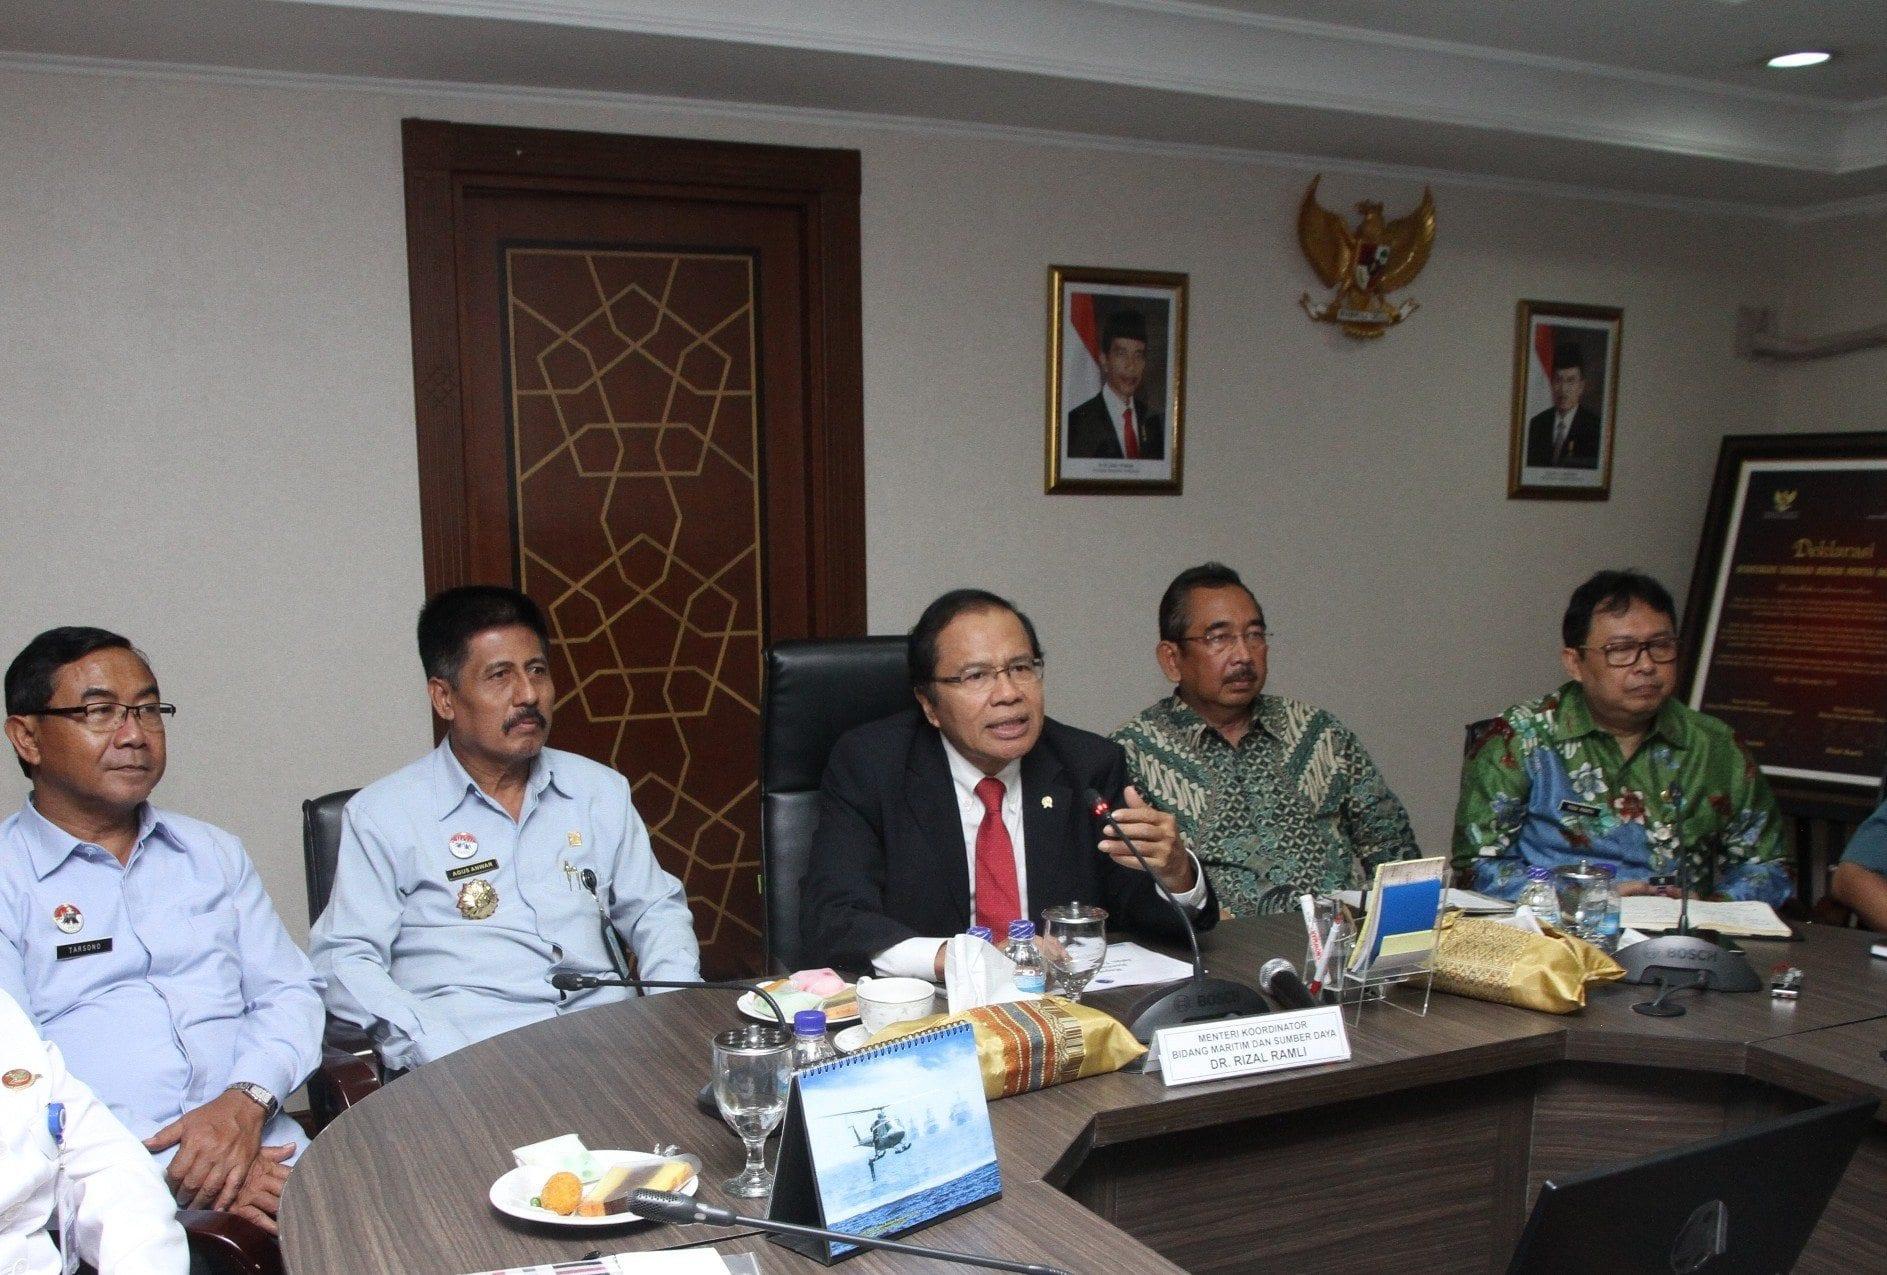 Menko RR: 'Bandung Intra Urban Tol Road' Segera Terealisasi